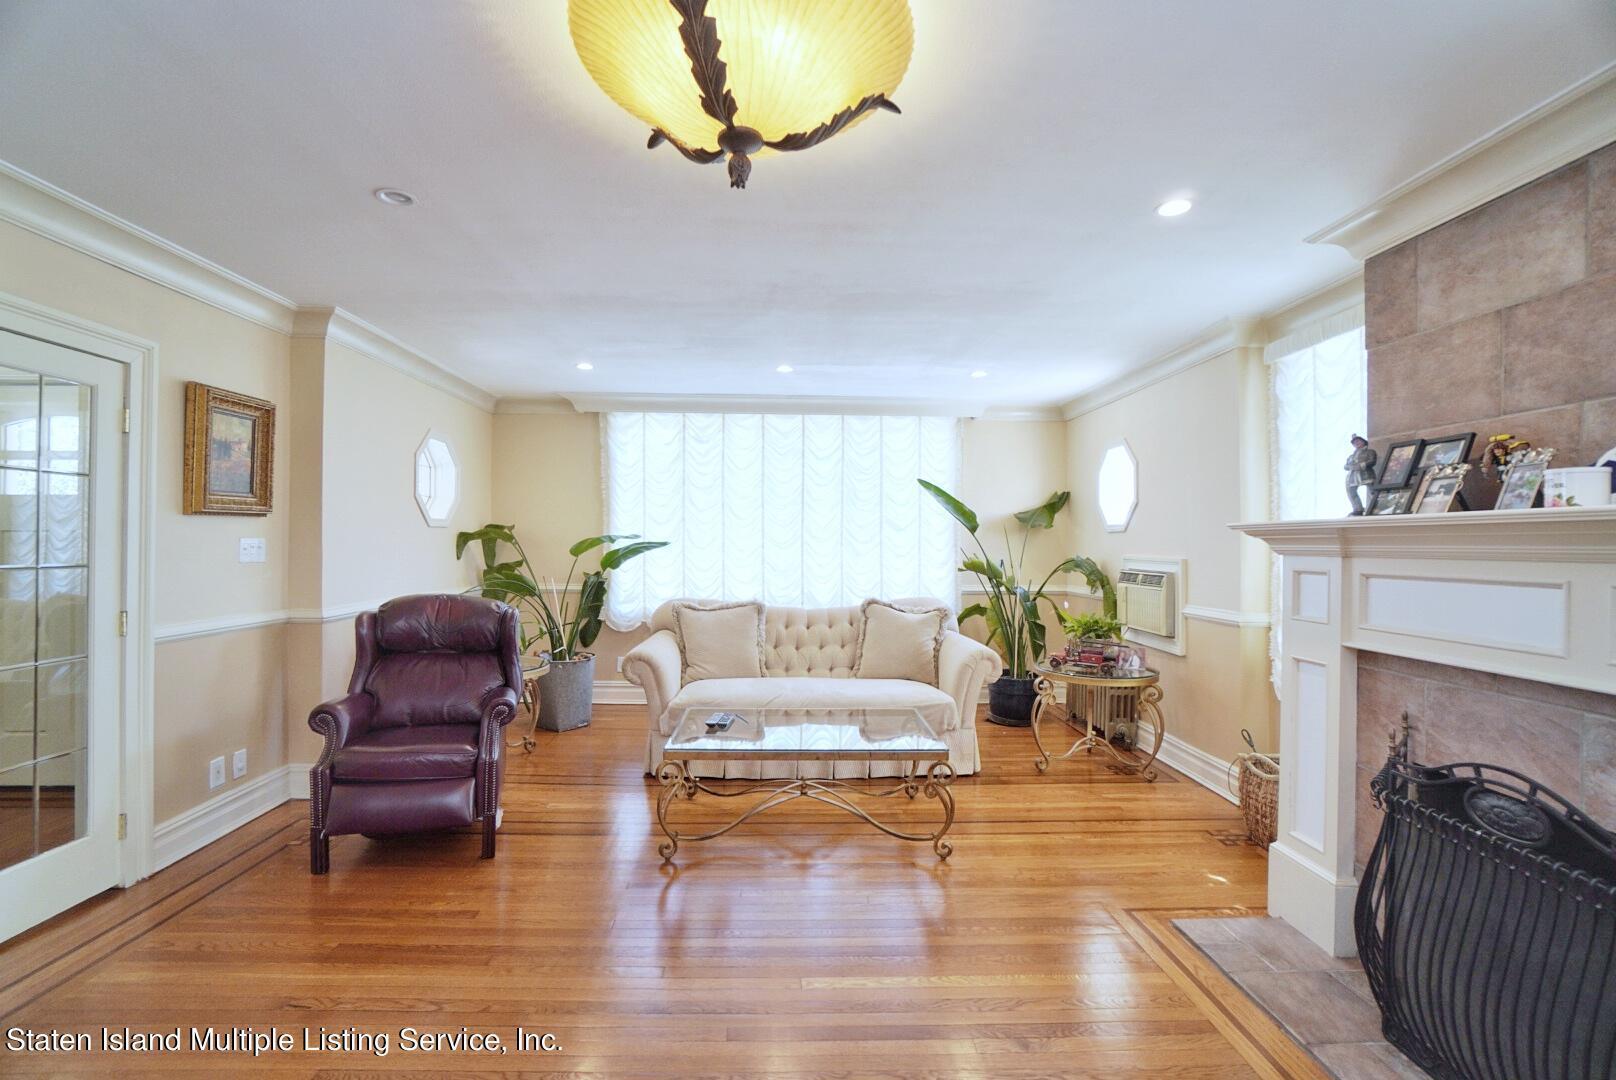 Single Family - Detached 264 Fisher Avenue  Staten Island, NY 10307, MLS-1146898-8